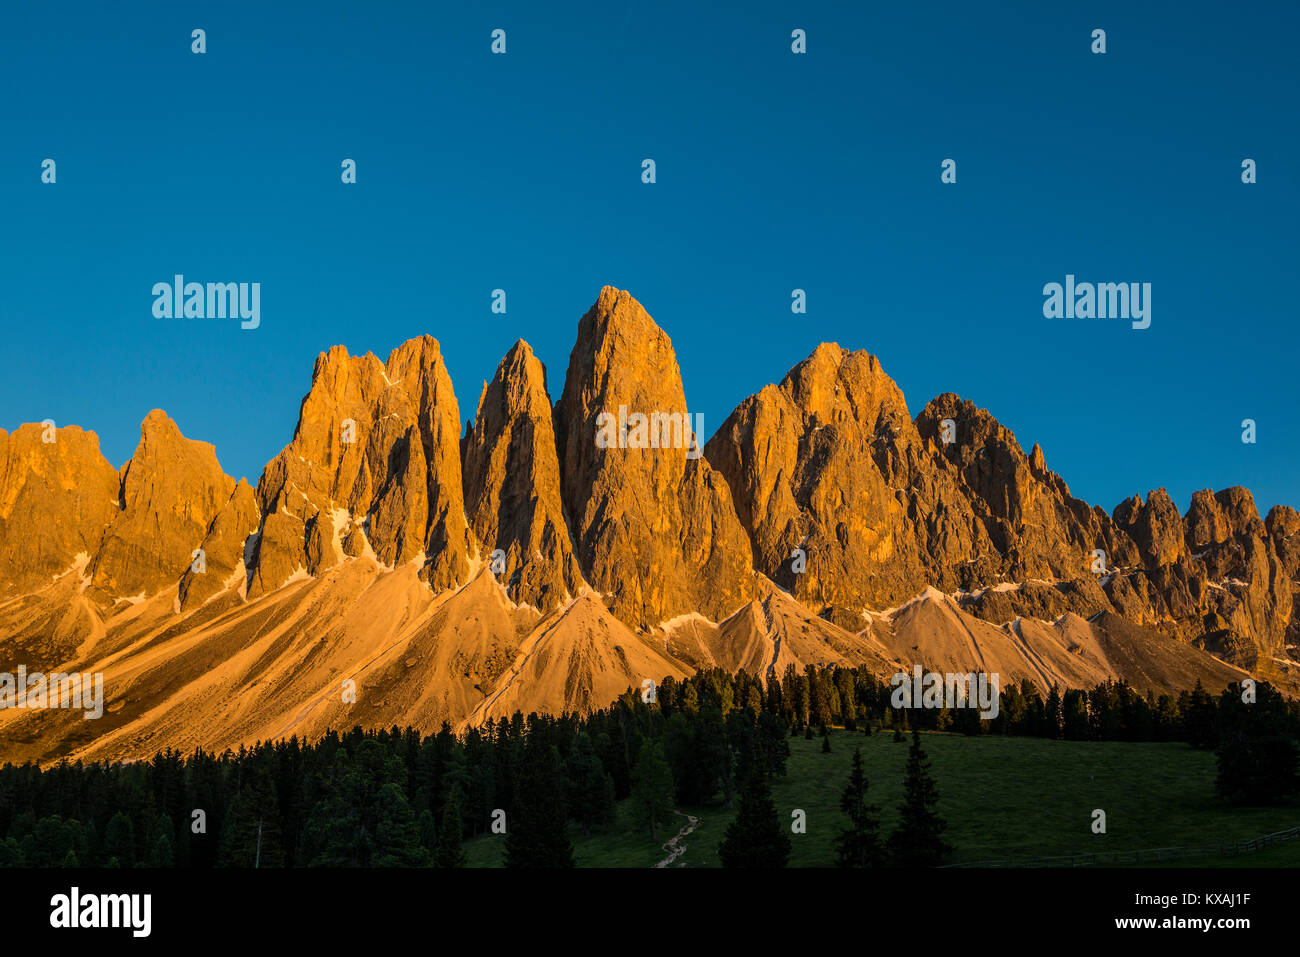 Sunset, glowing Geisler peaks, Villnösstal, Sass Rigais, Dolomites, South Tyrol, Italy - Stock Image